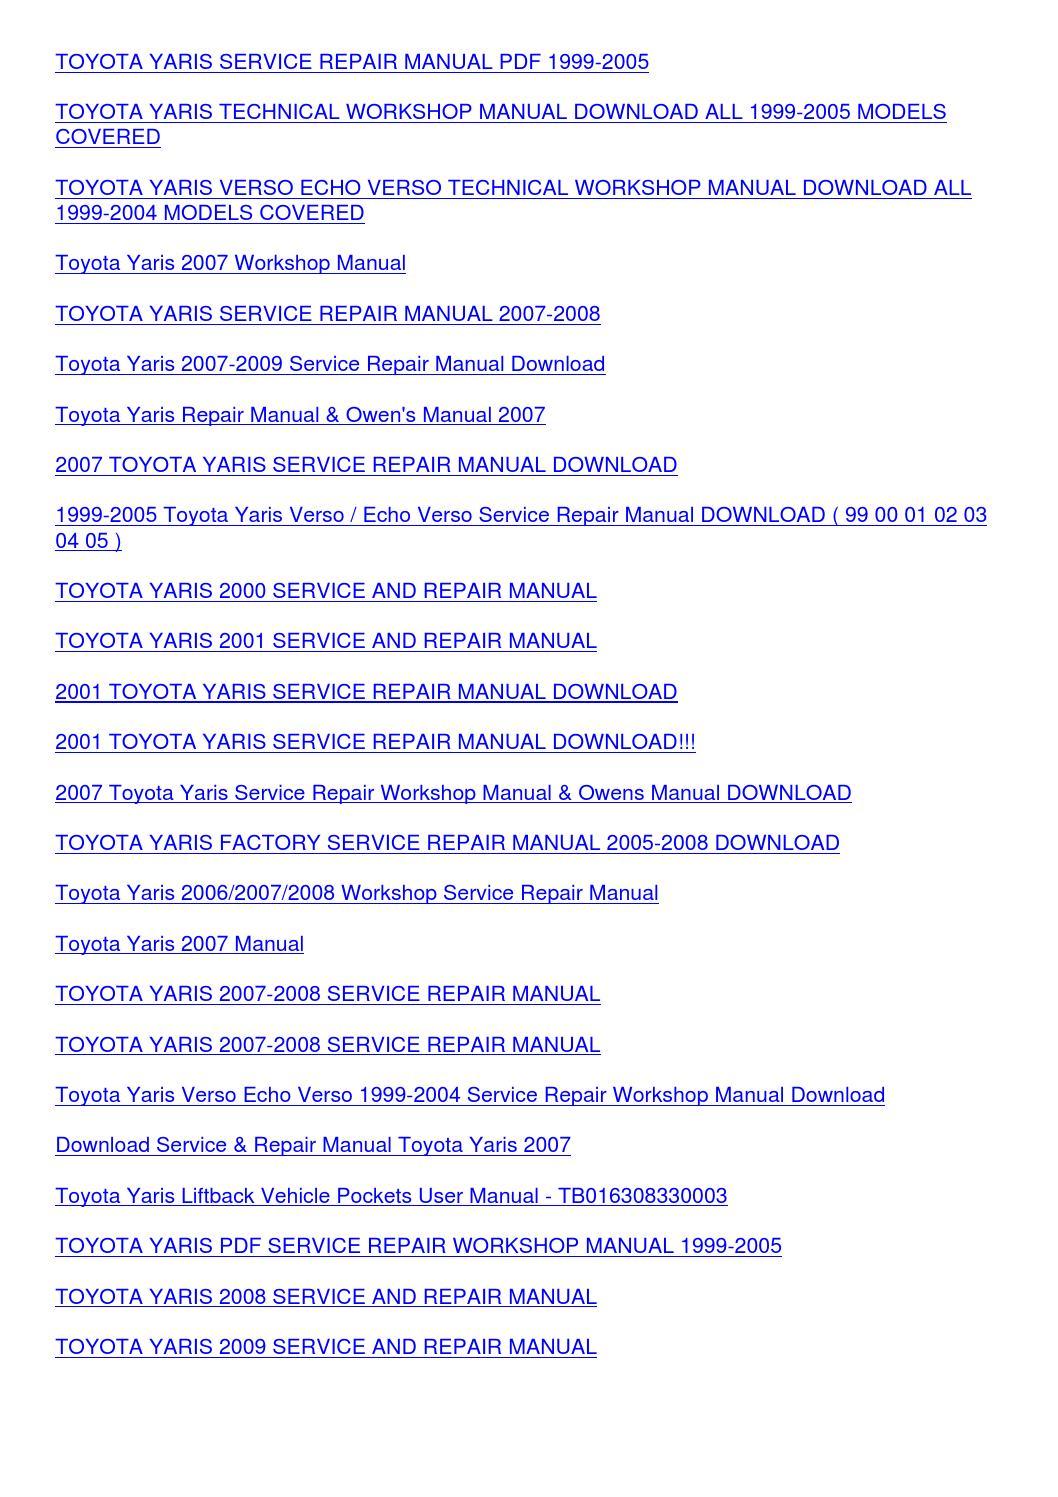 Toyota yaris 2004 service manual pdf